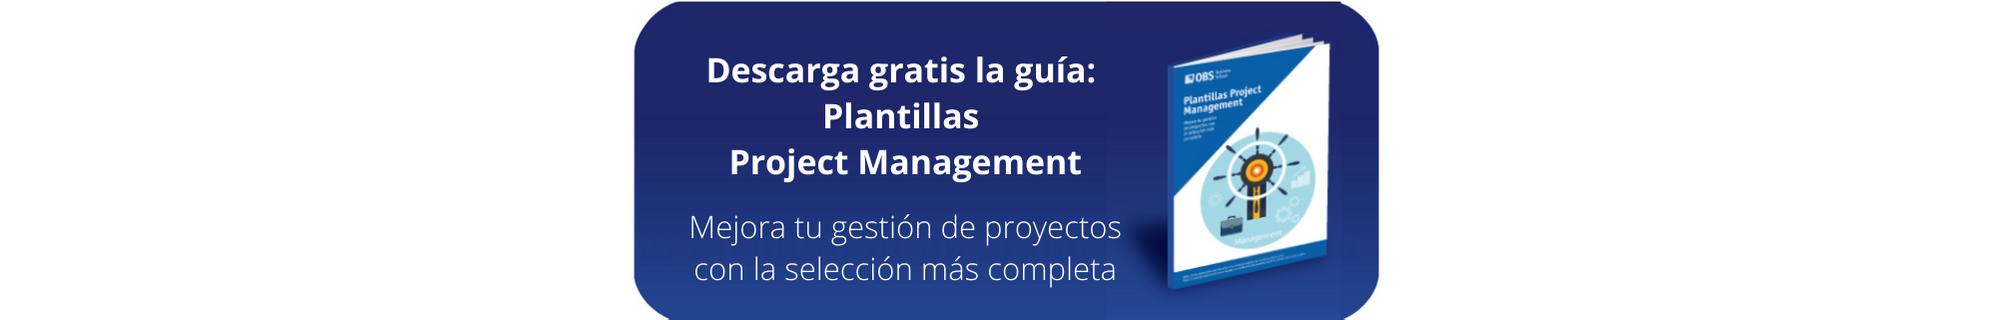 Ebook GRATIS: Plantillas Project Management